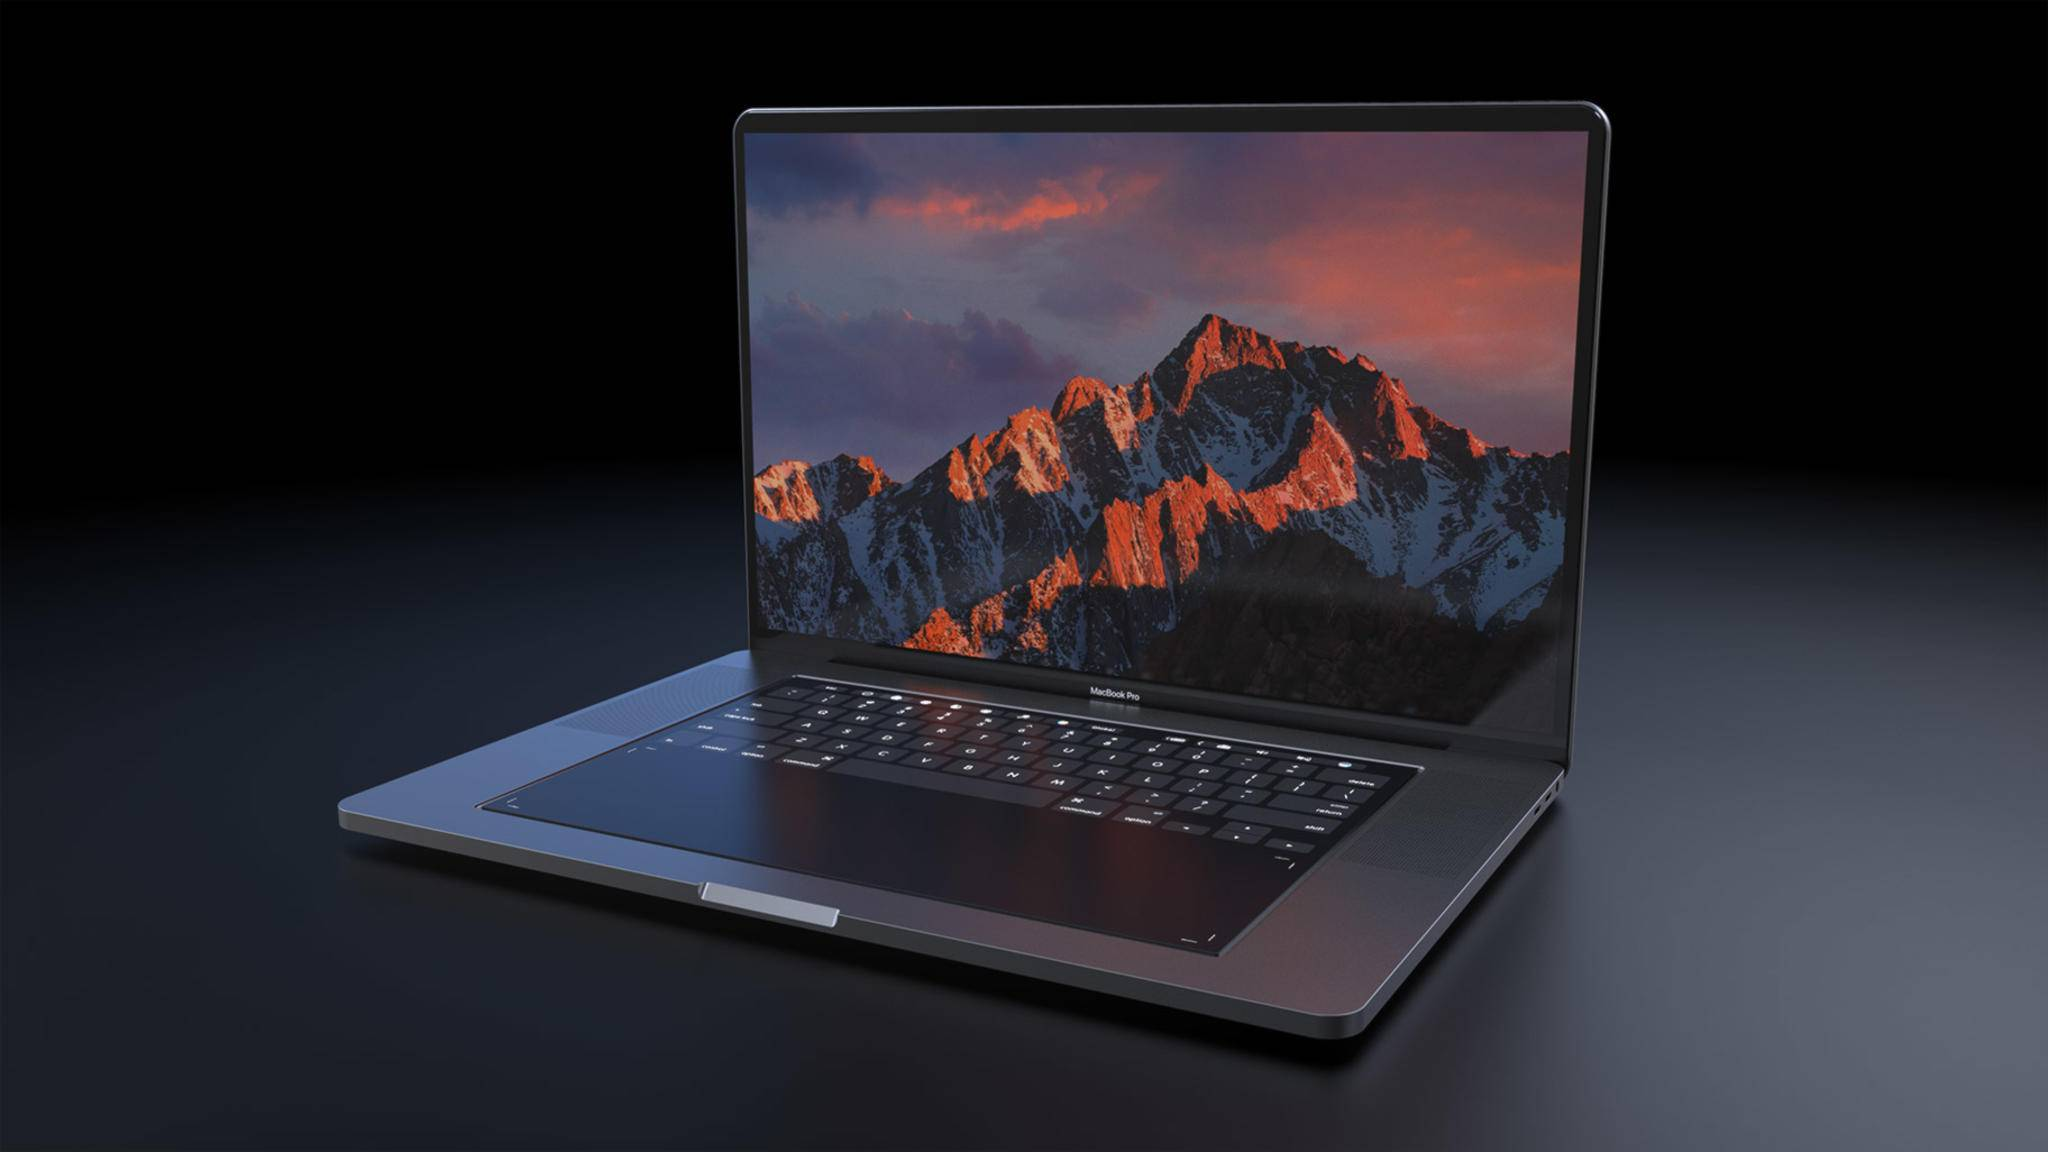 Wird Apple im Herbst ein MacBook Pro mit 16 Zoll Bildschirmdiagonale in den Handel bringen?